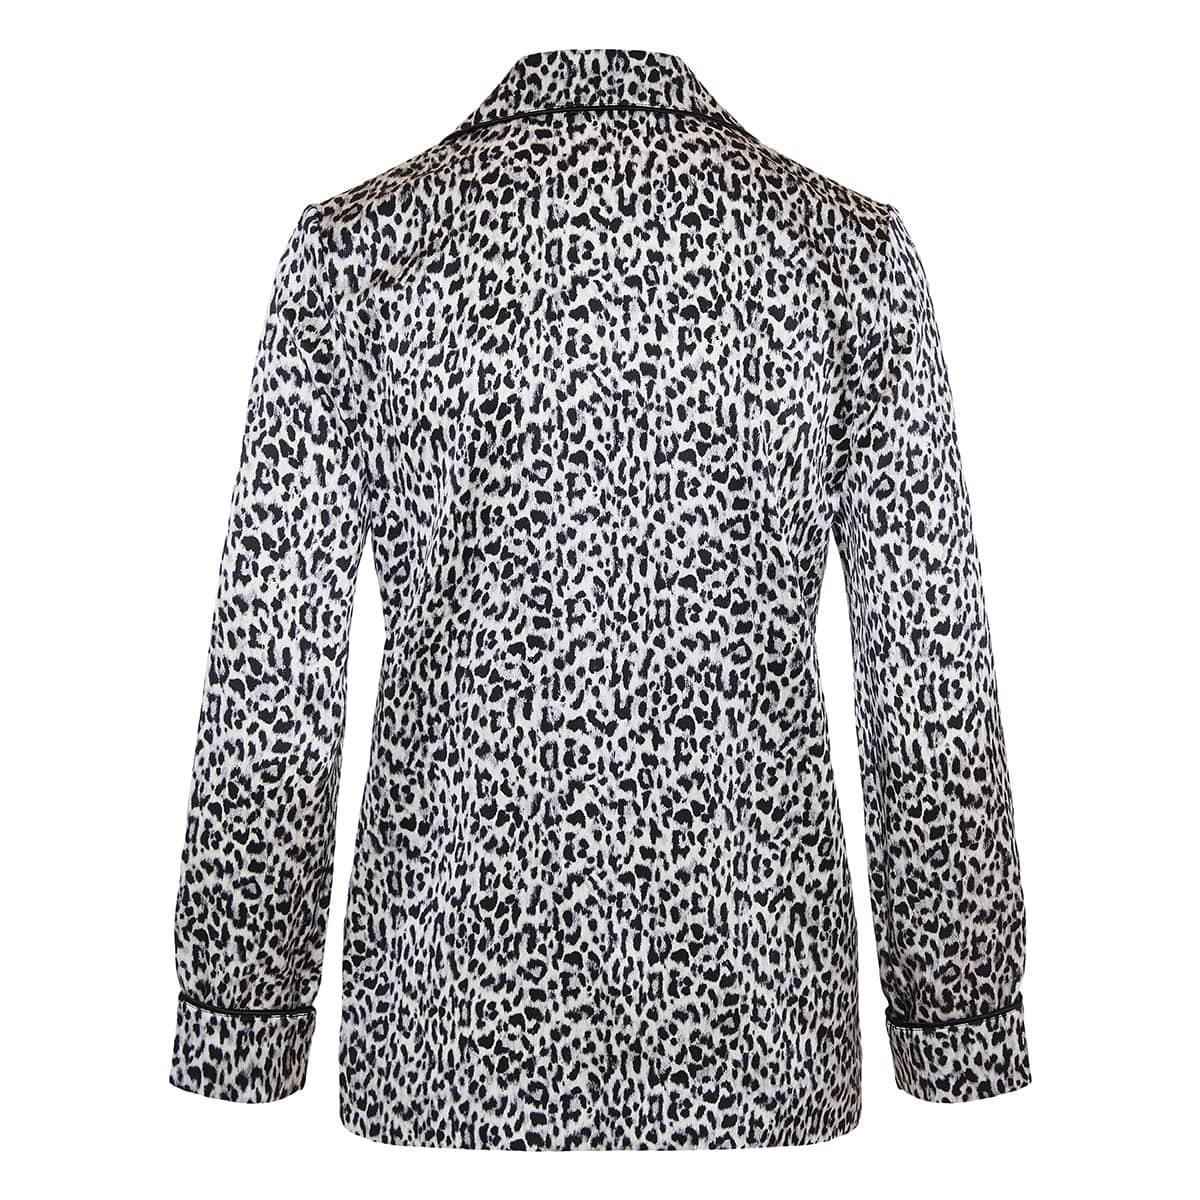 Leopard silk pajama shirt